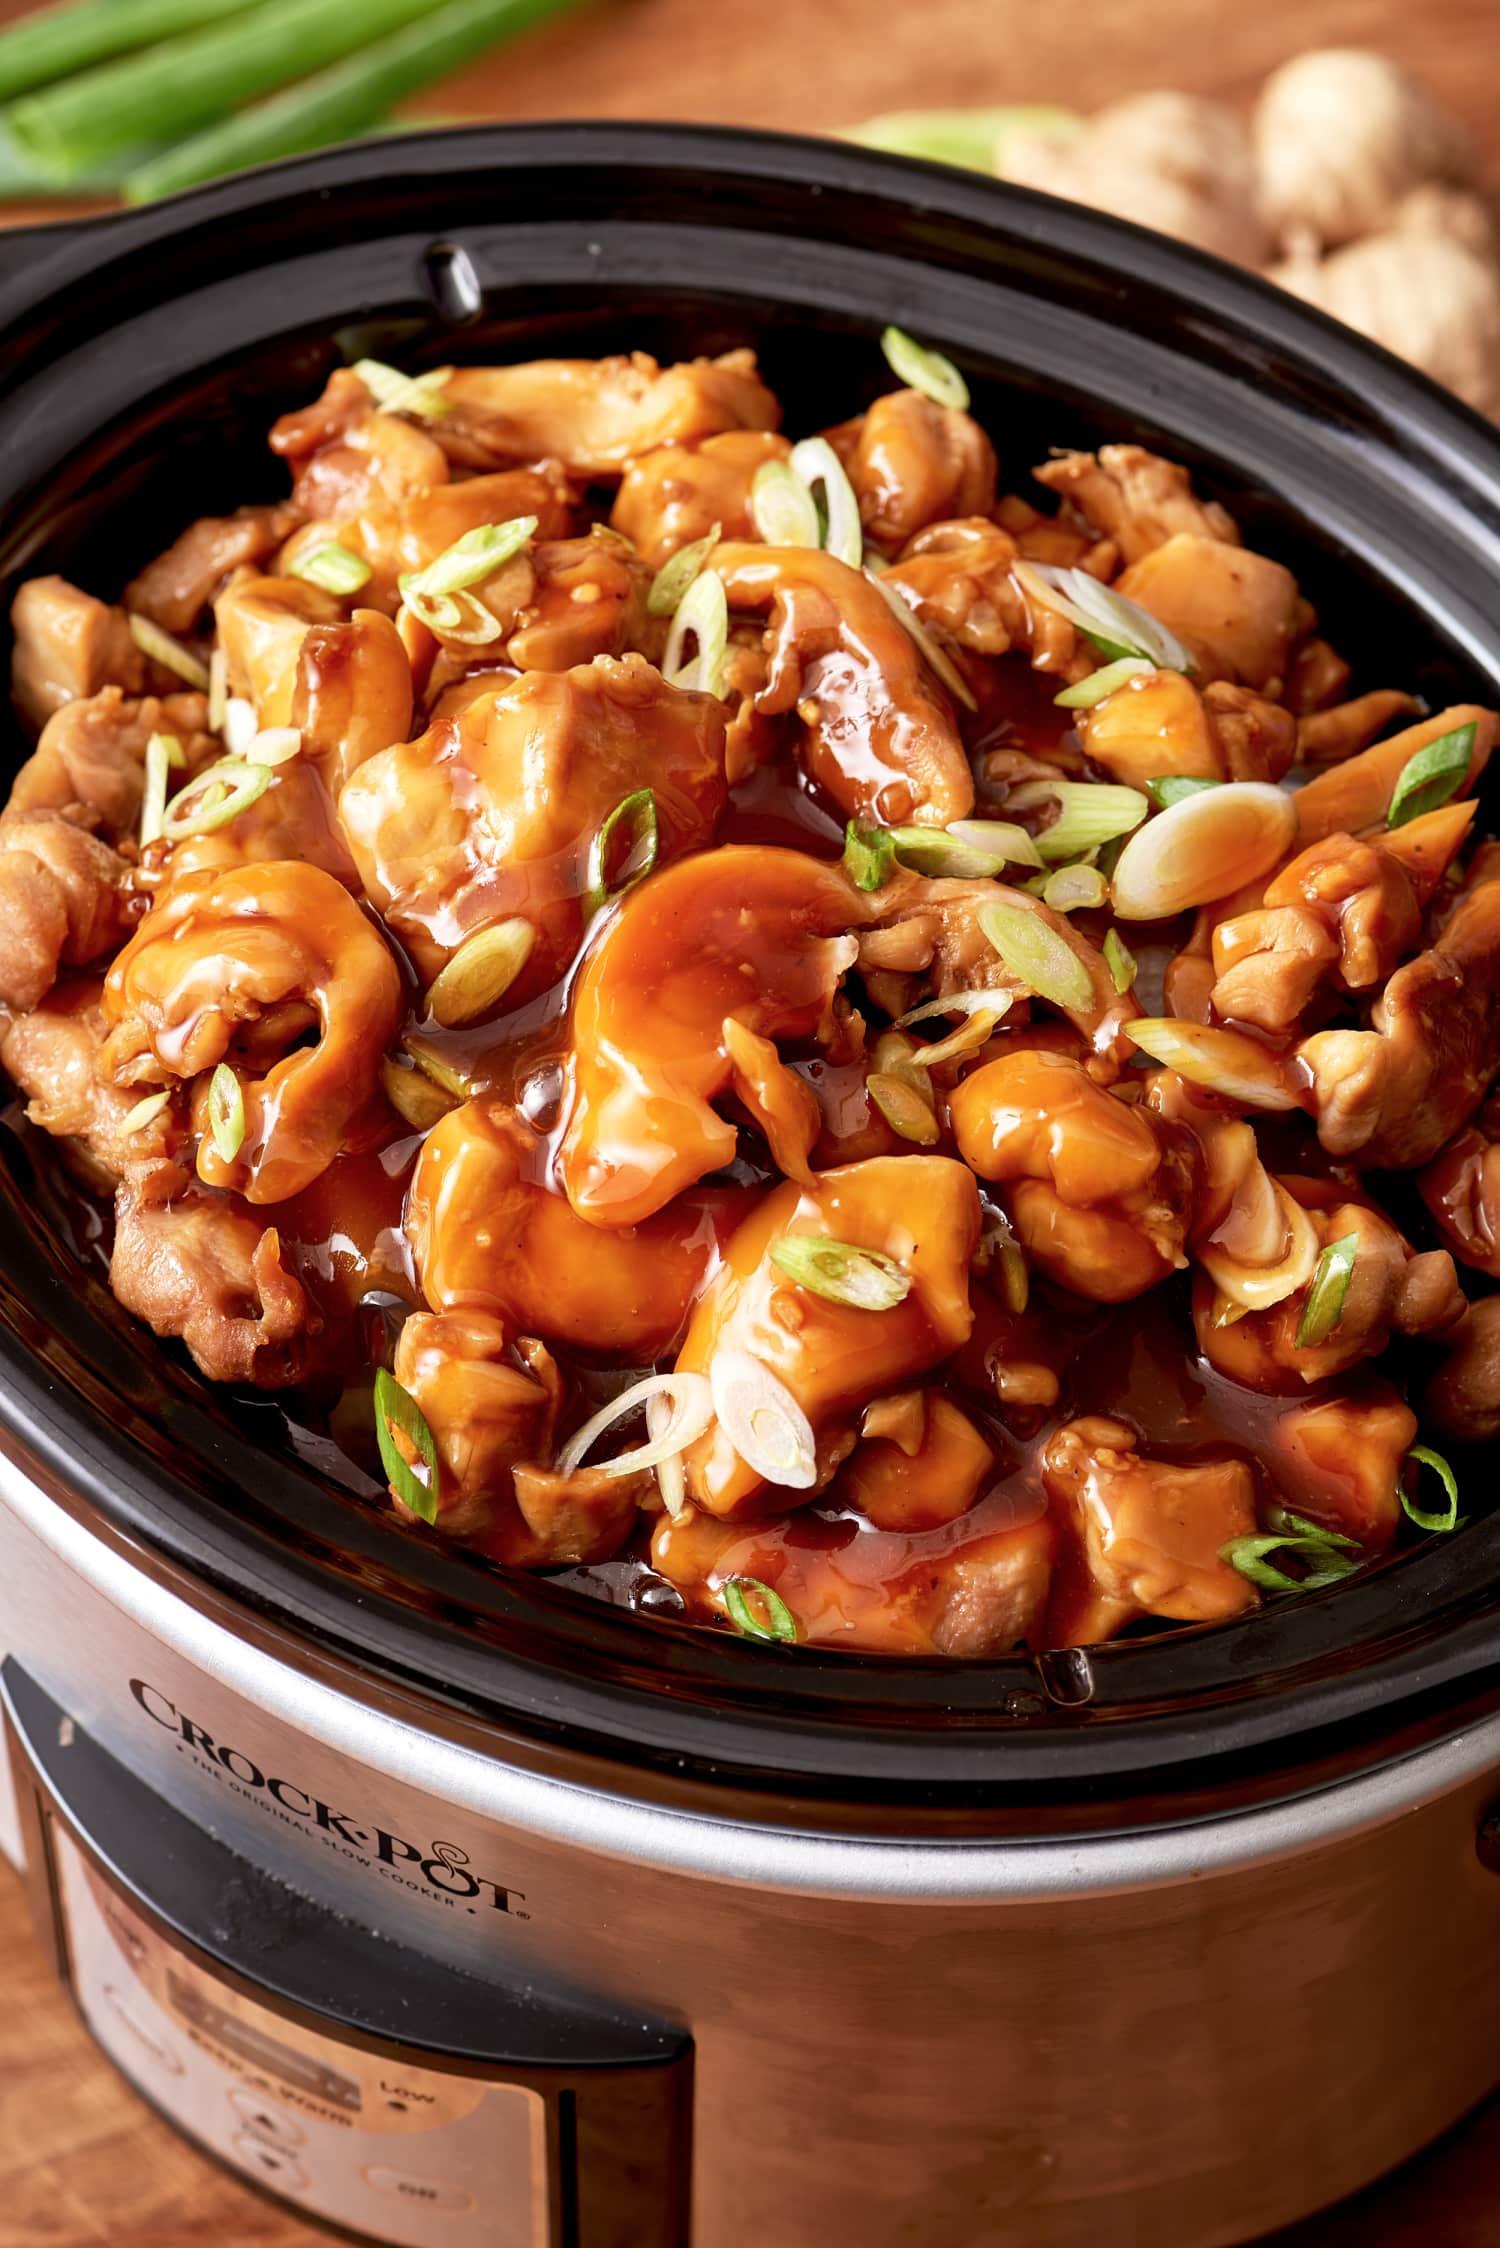 Recipe: Slow Cooker Honey Teriyaki Chicken